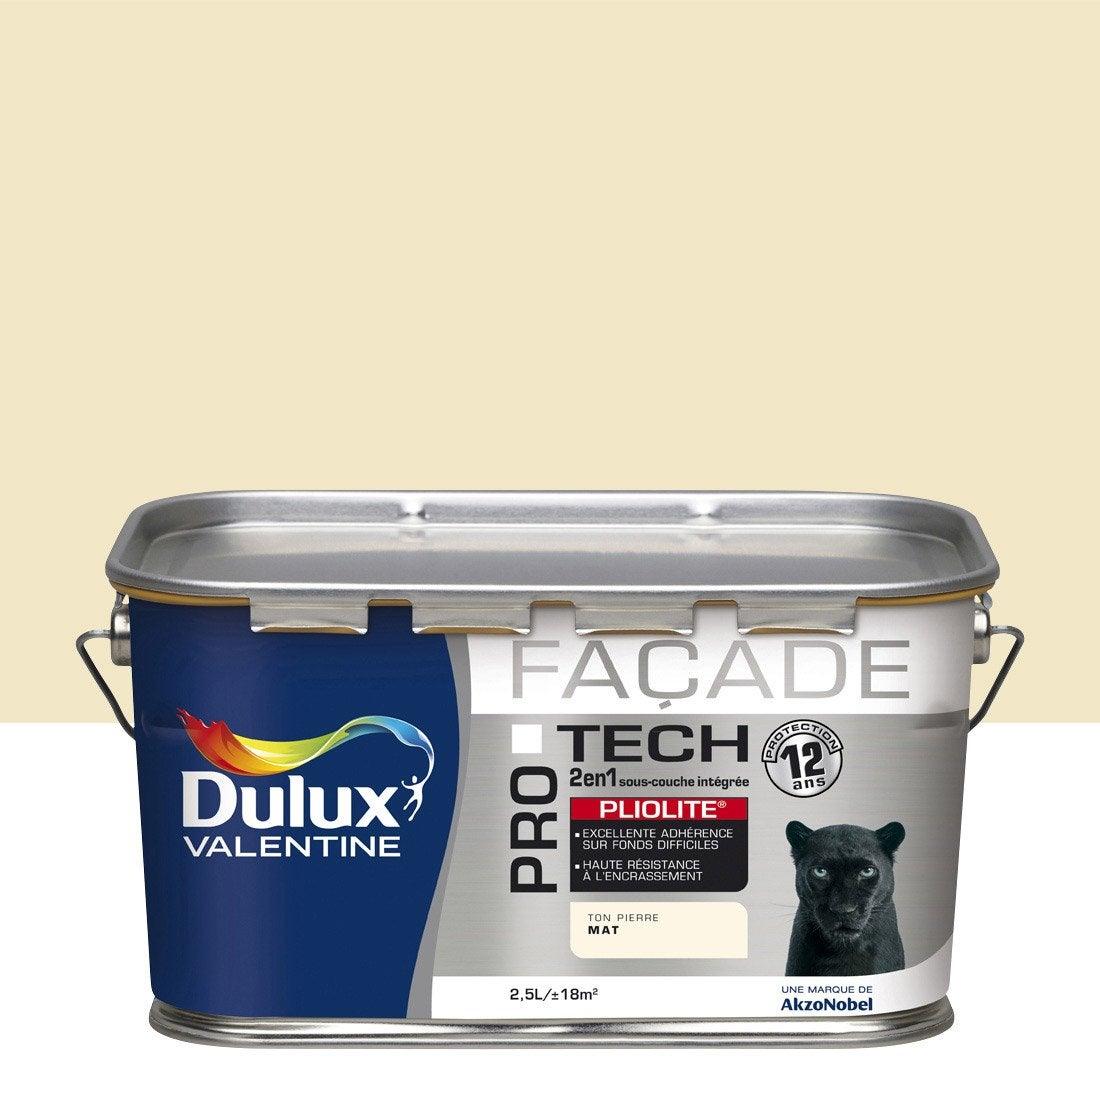 peinture fa ade protec pliolite dulux valentine ton pierre 2 5 l leroy merlin. Black Bedroom Furniture Sets. Home Design Ideas